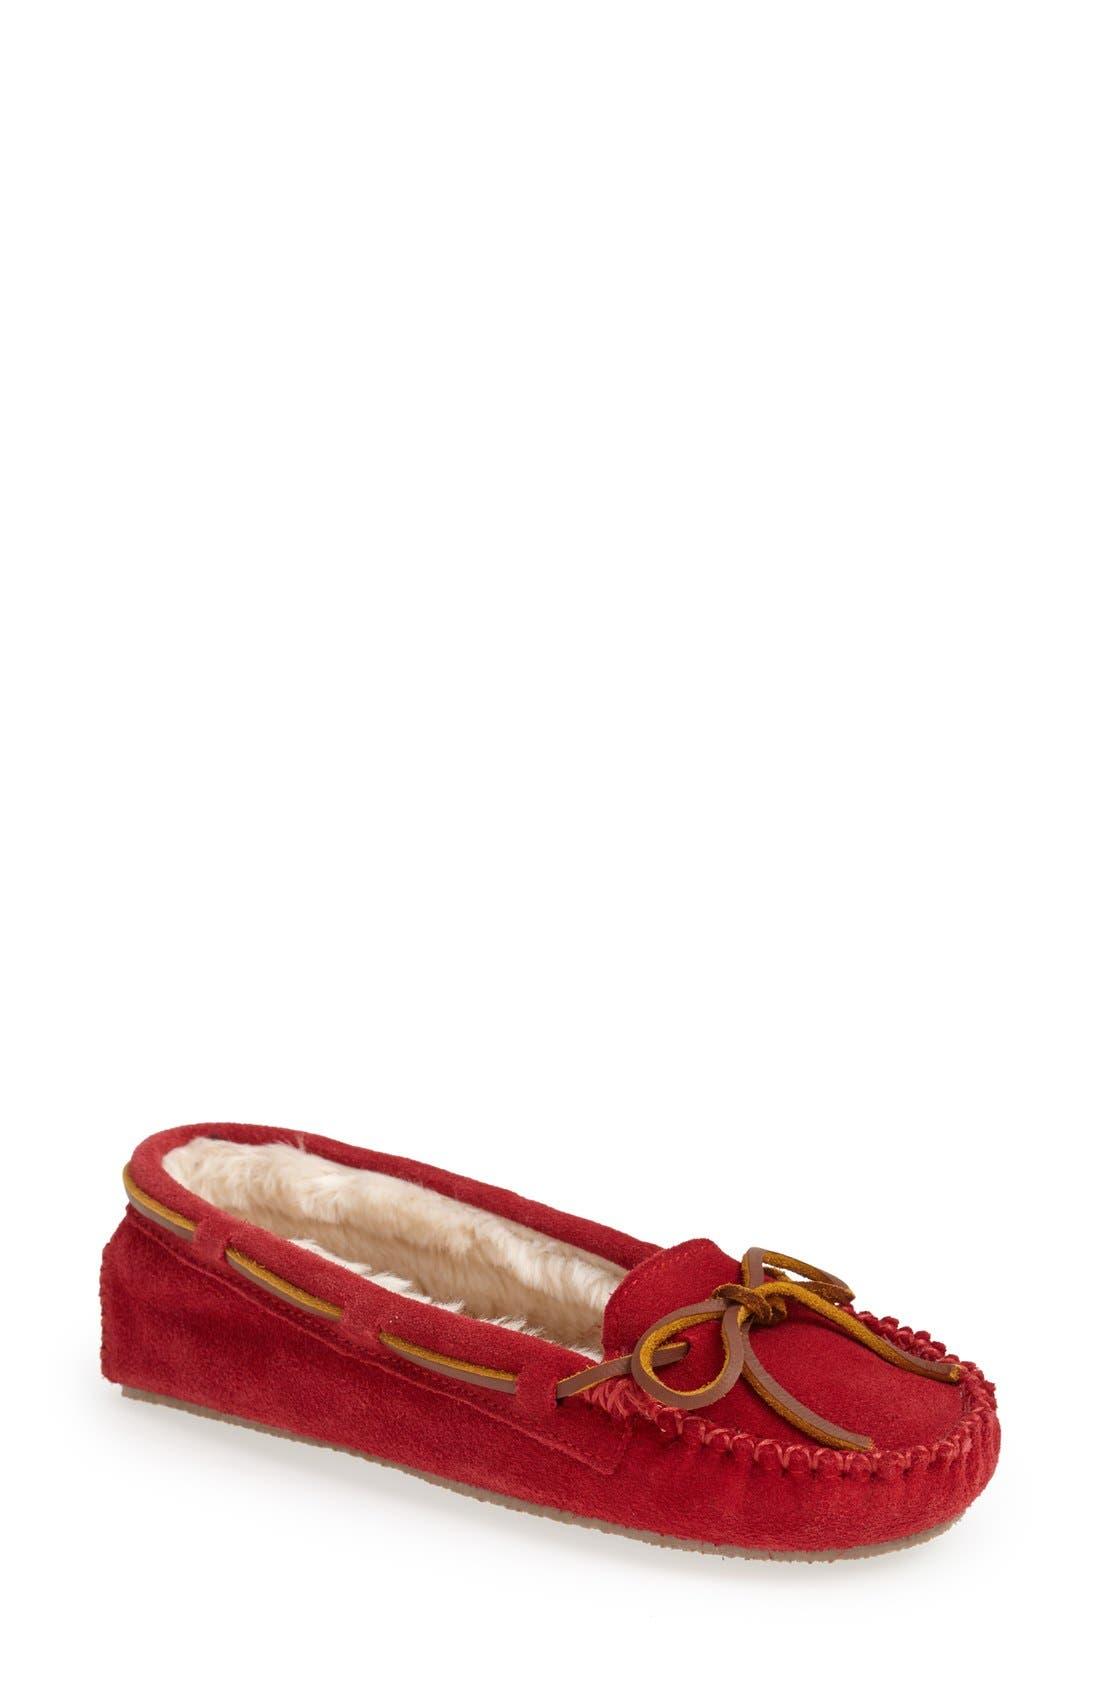 MINNETONKA 'Cally' Slipper, Main, color, RED